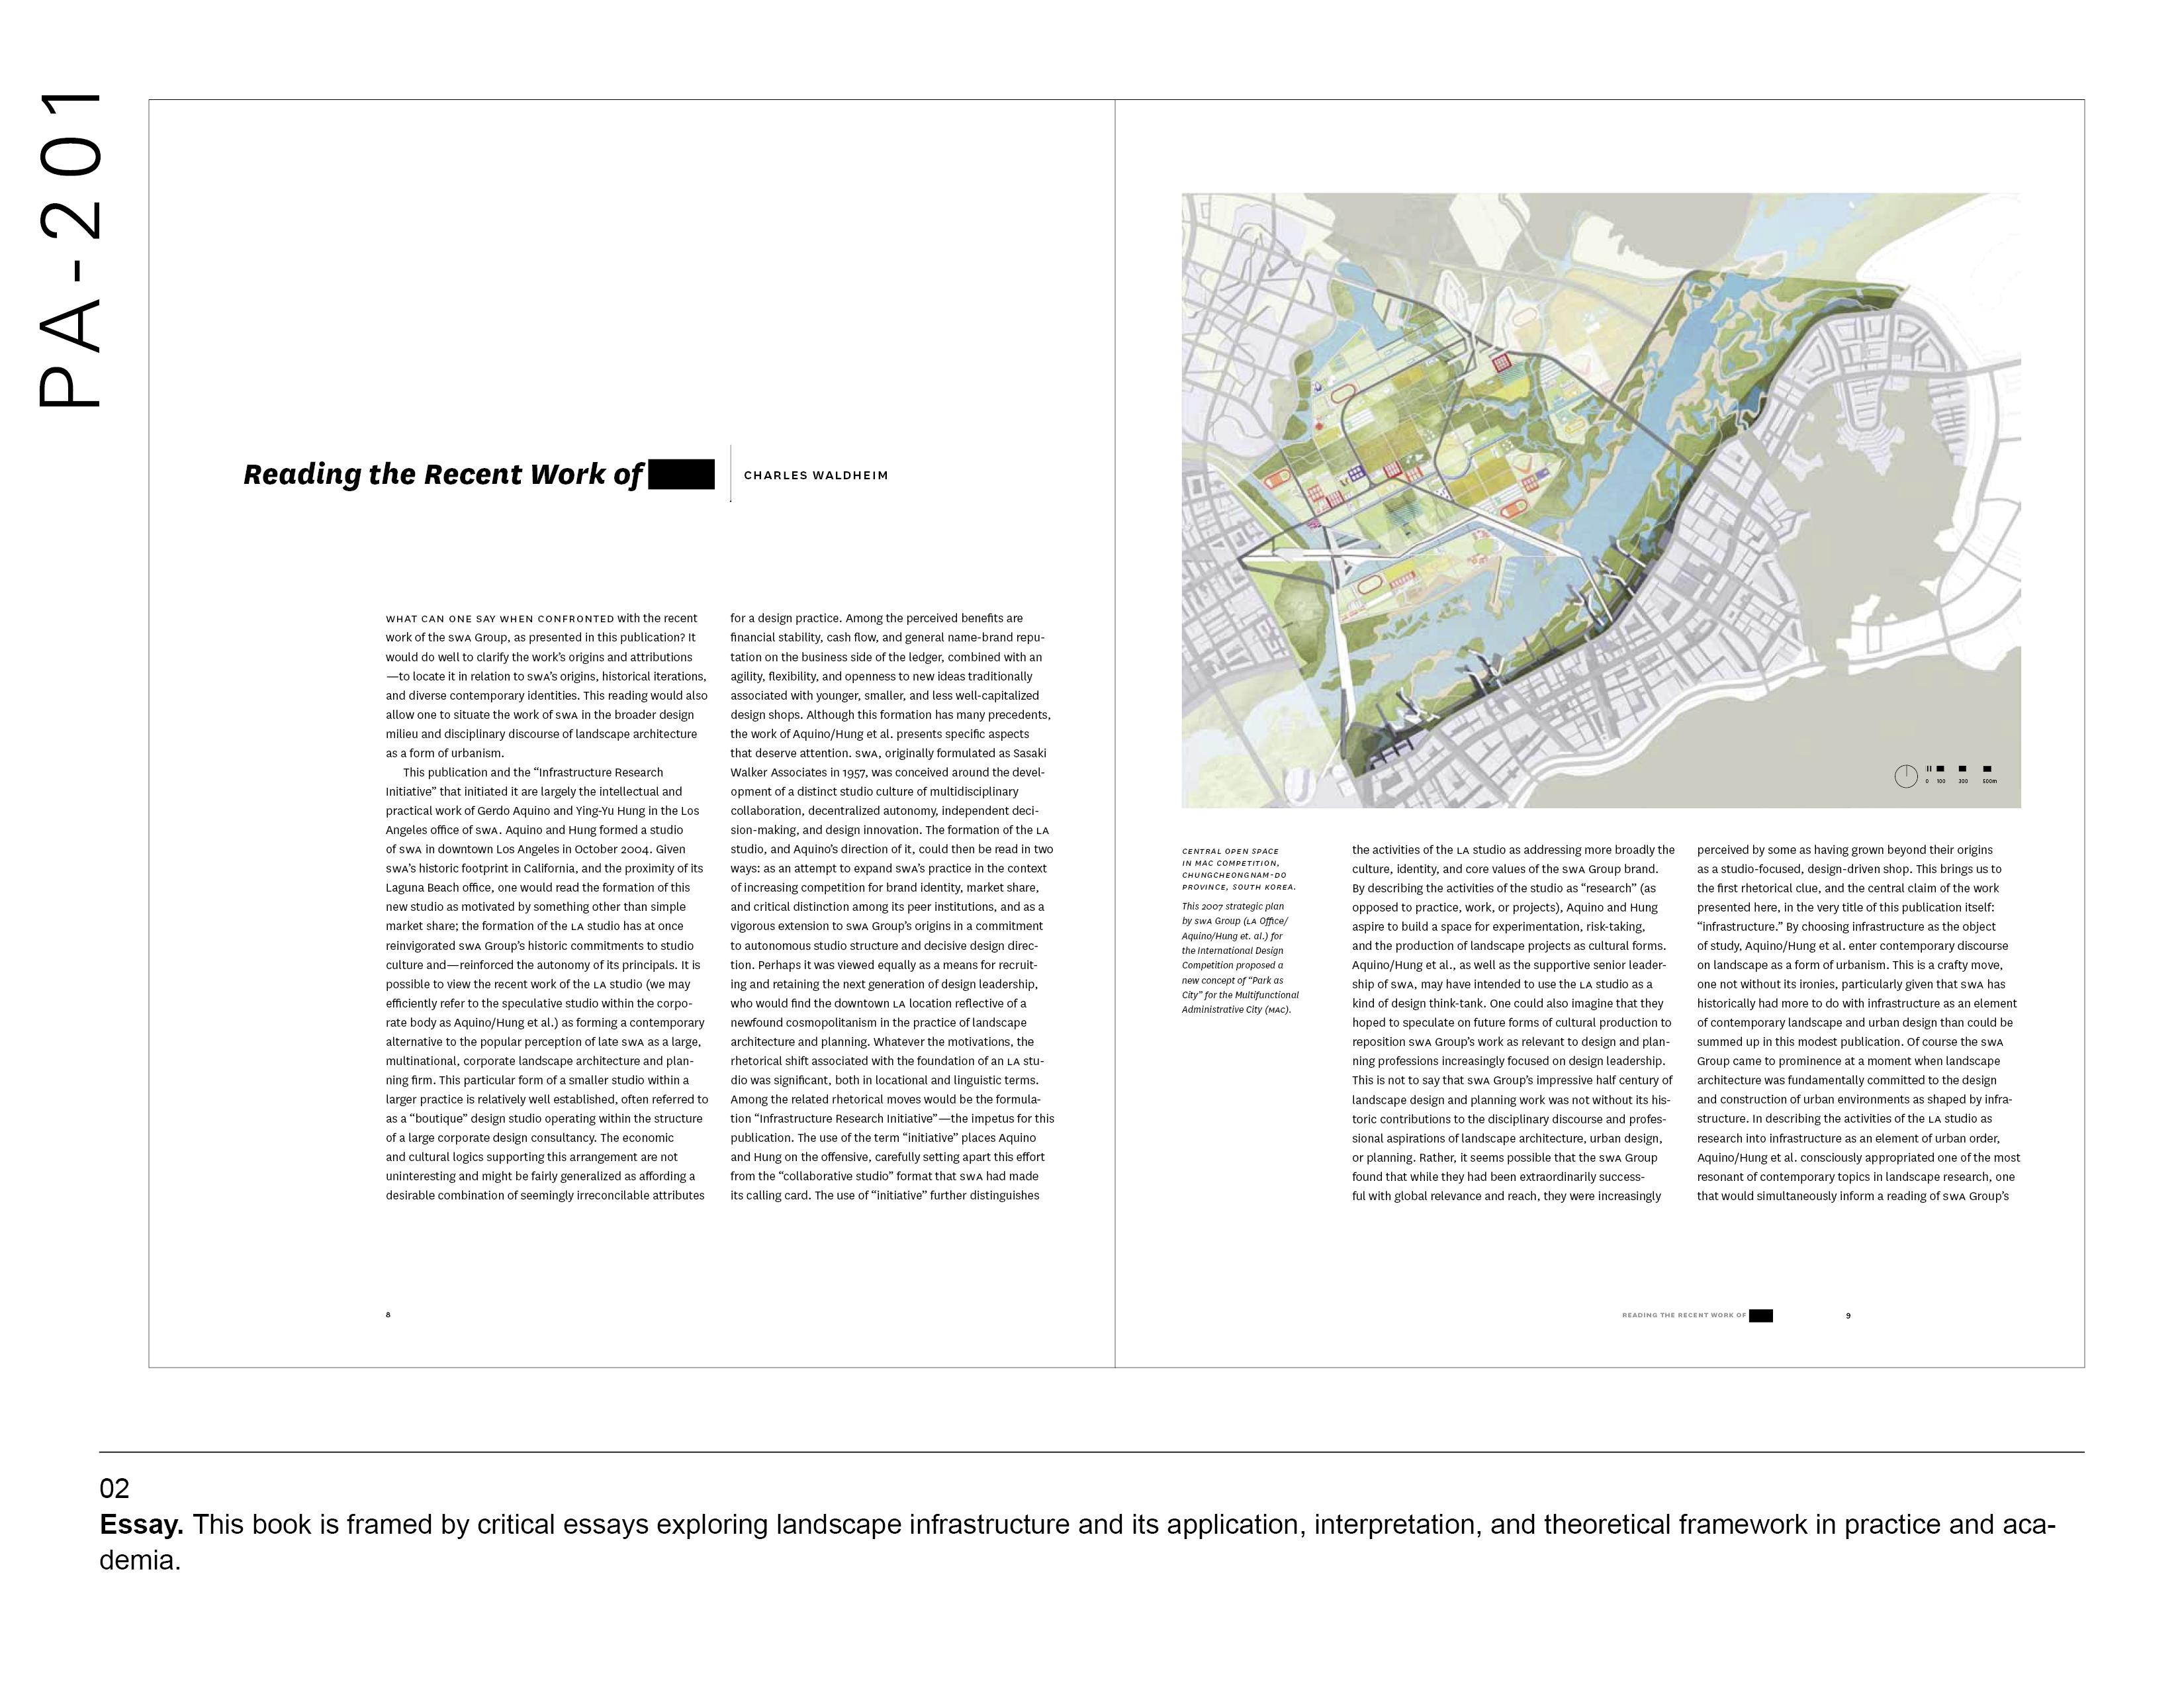 003 Landscape Architecture Essay Example 201 02 Stunning Argumentative Topics Full